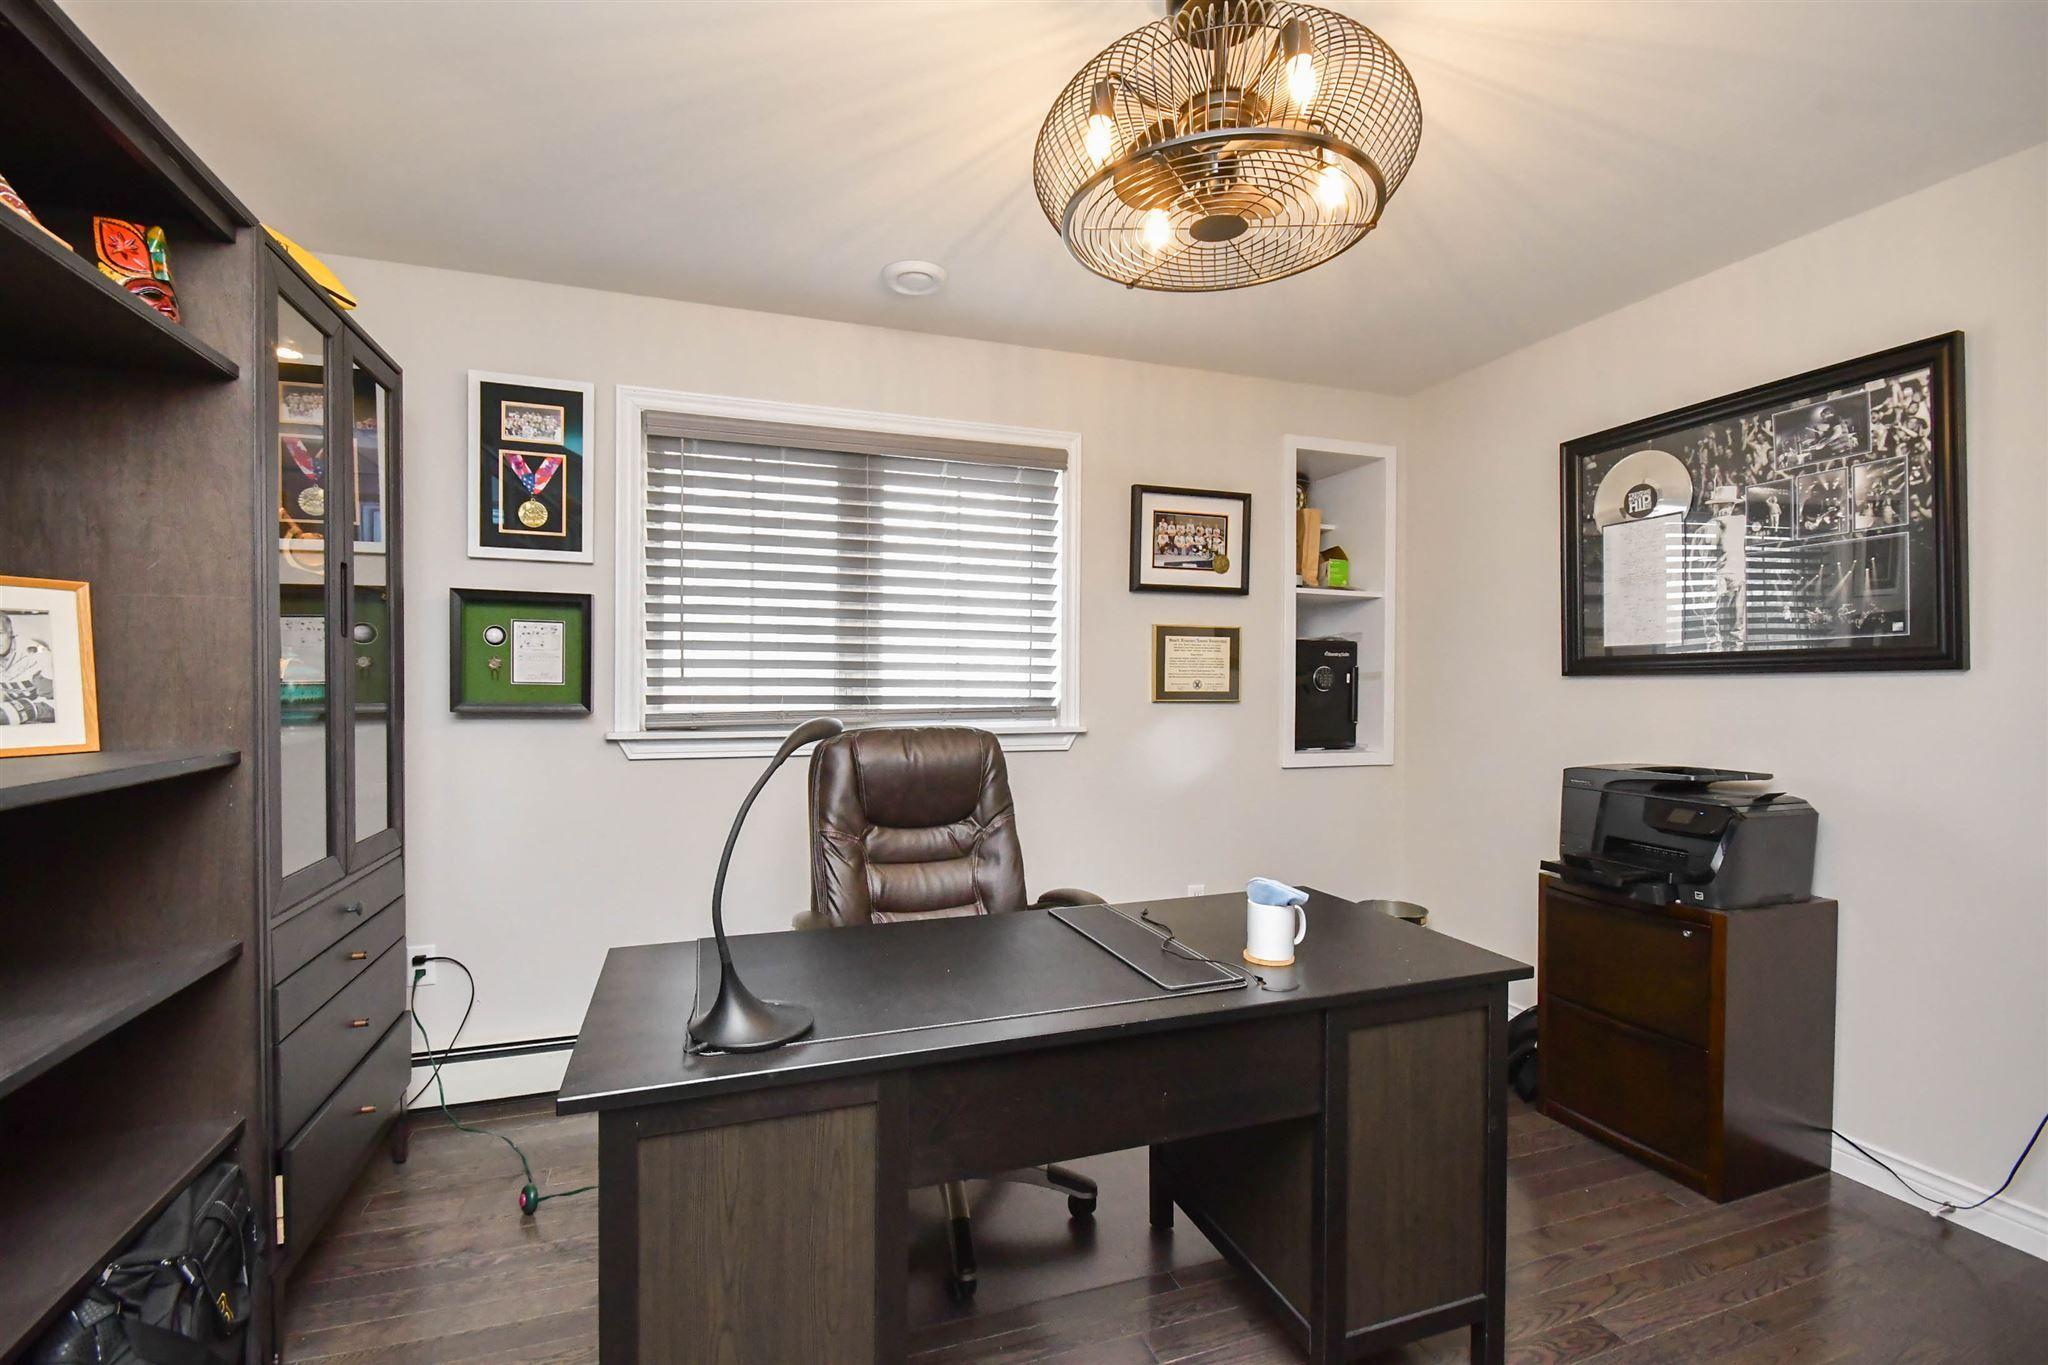 Photo 16: Photos: 17 Armstrong Court in Halifax: 5-Fairmount, Clayton Park, Rockingham Residential for sale (Halifax-Dartmouth)  : MLS®# 202105075